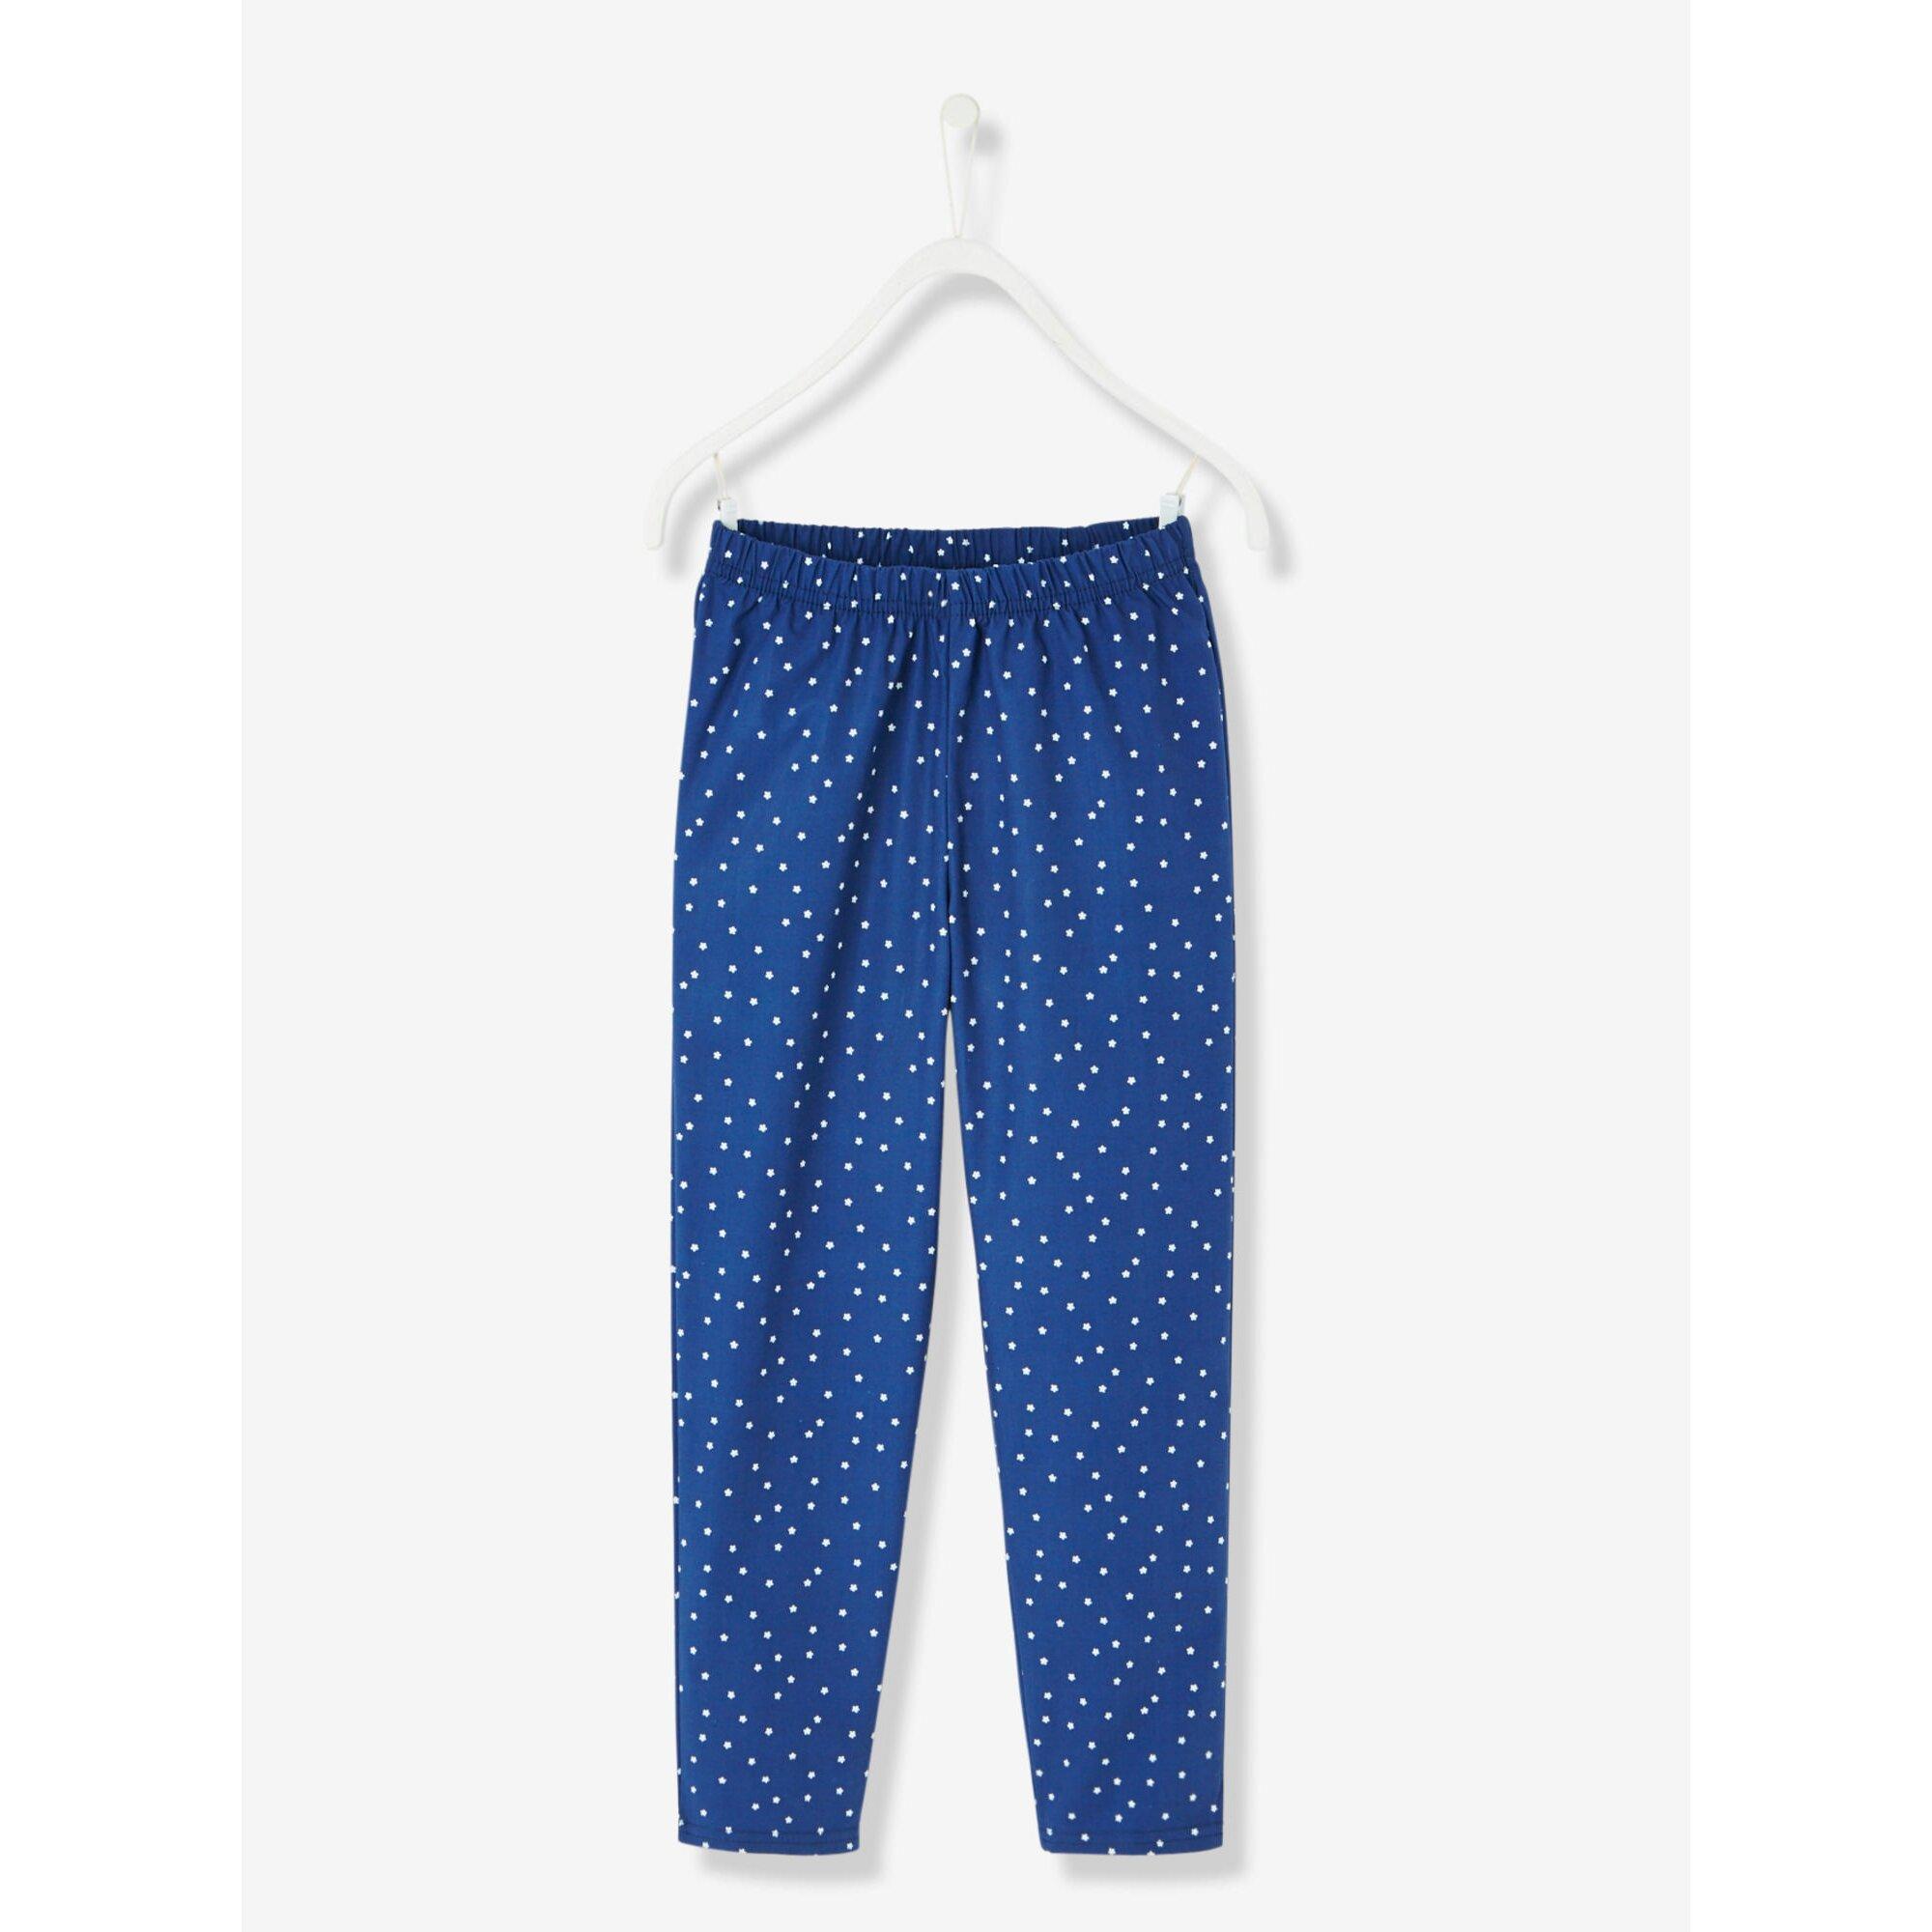 vertbaudet-madchenschlafanzug-materialmix, 20.99 EUR @ babywalz-de